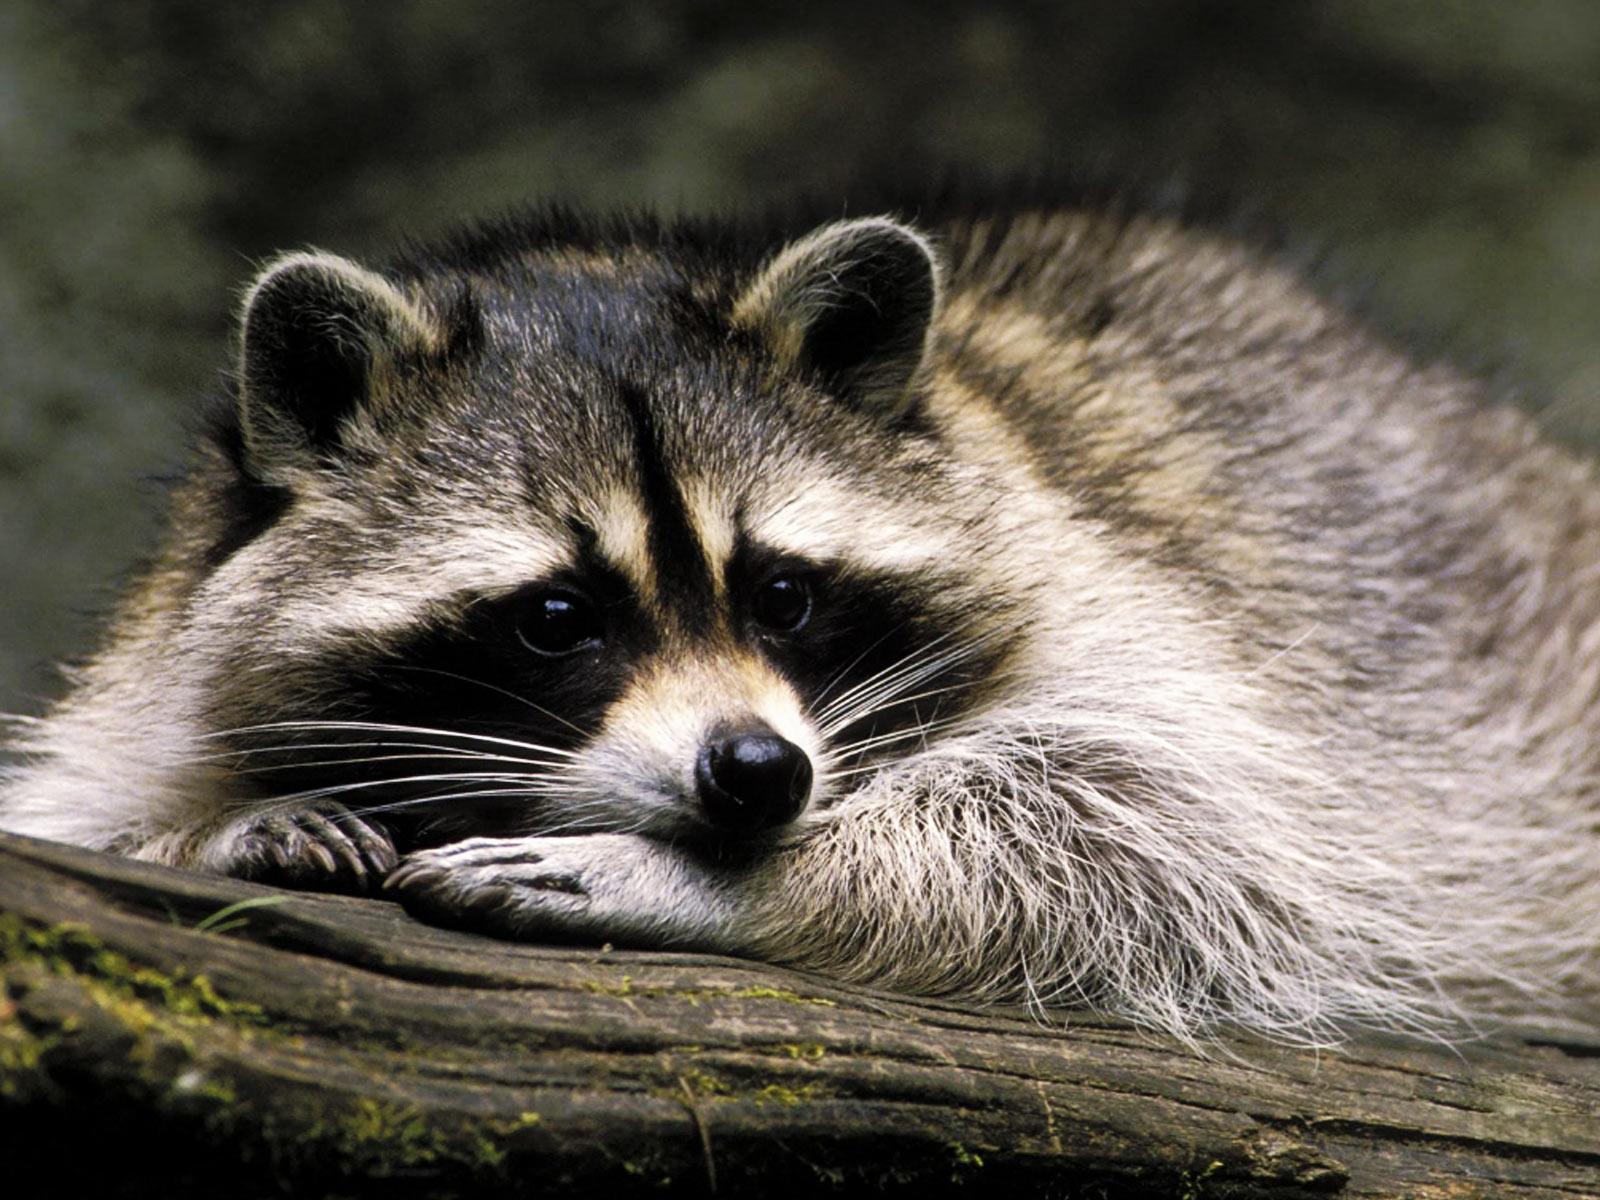 raccoon animals photo 30710854 fanpop